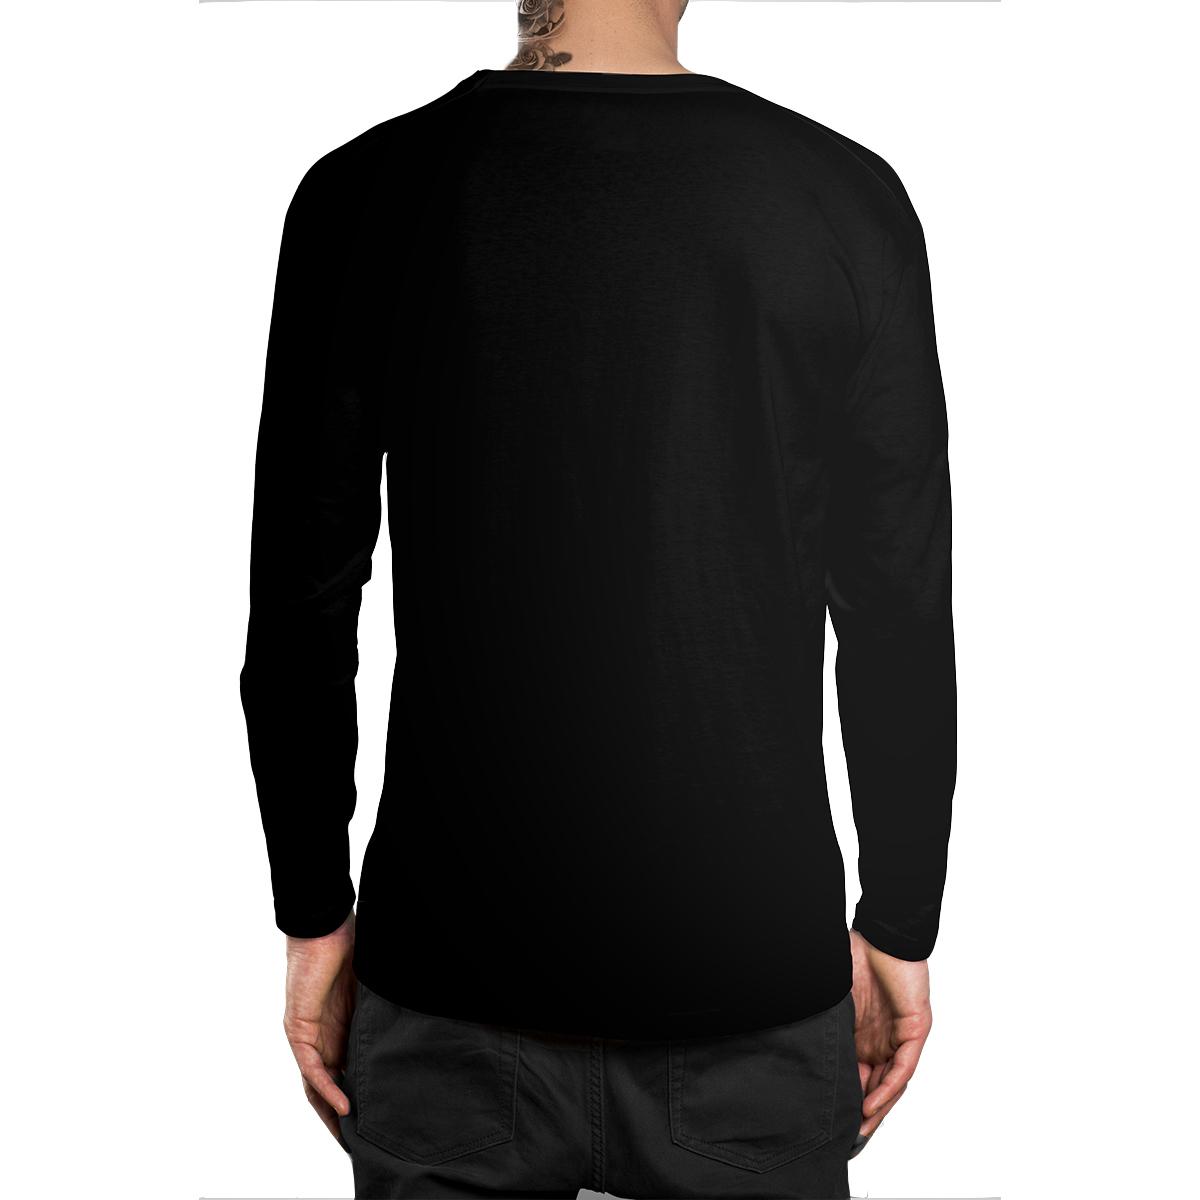 Stompy Camiseta Manga Longa Modelo 13